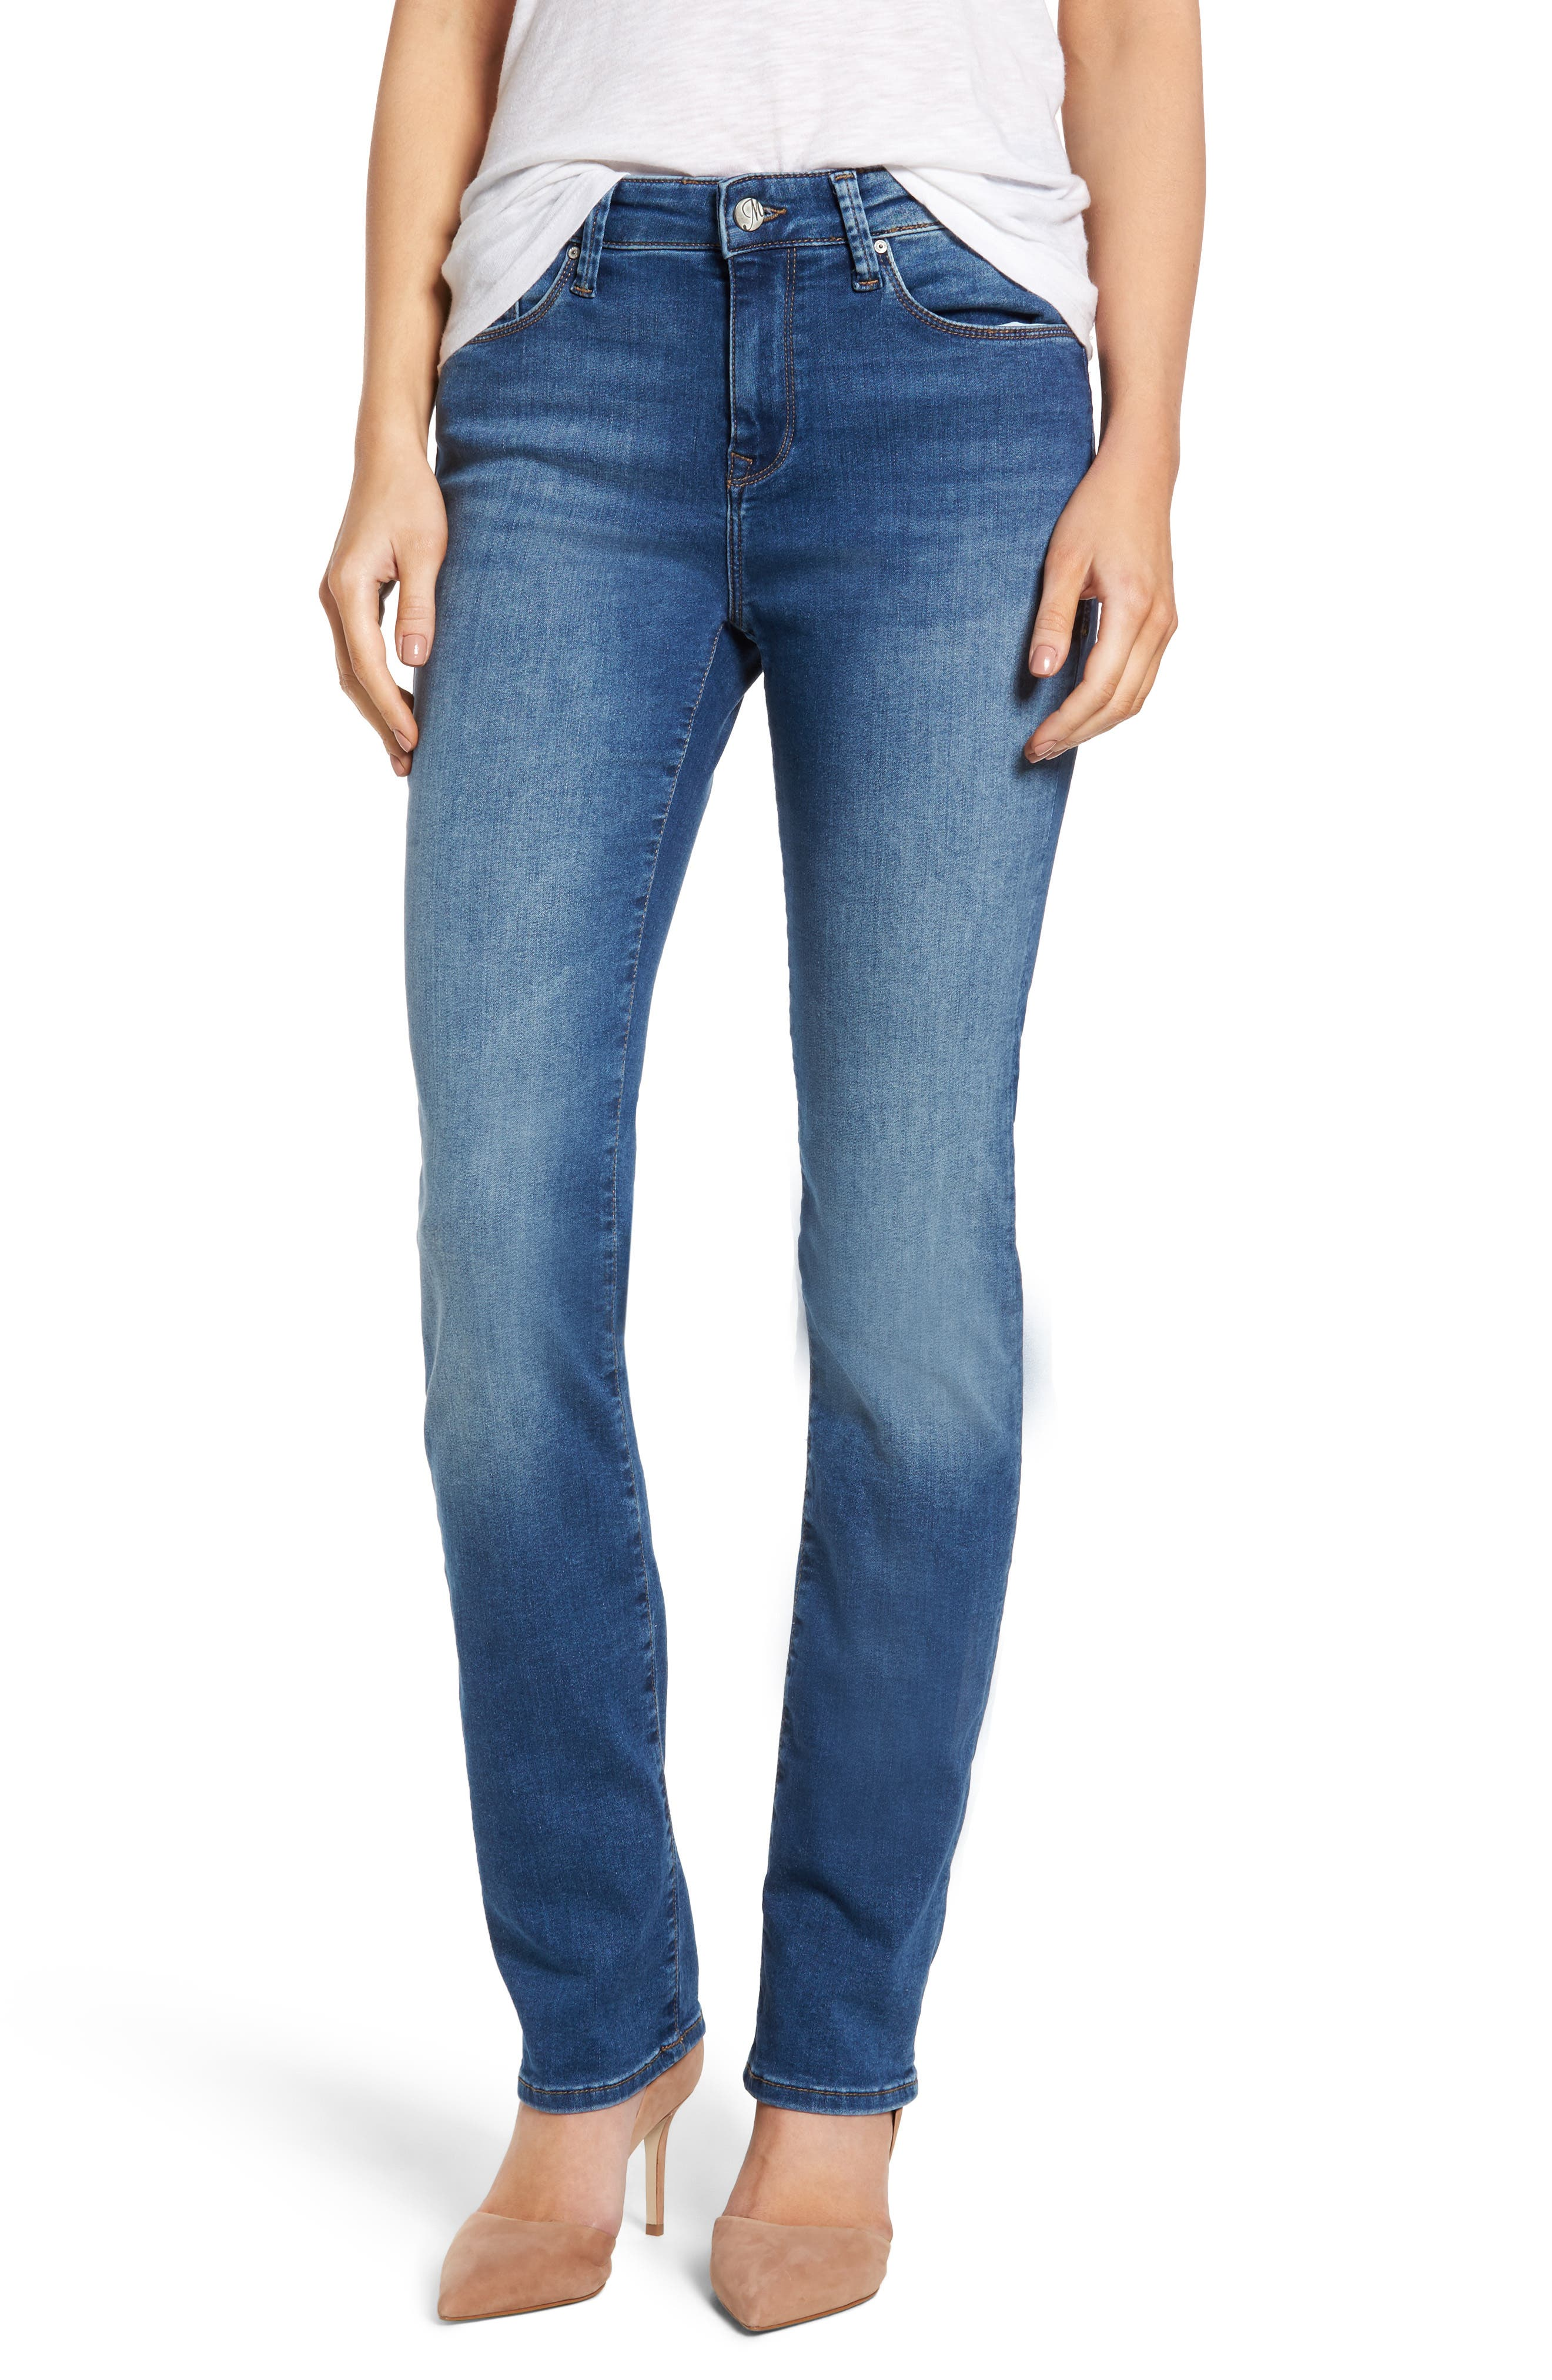 Alternate Image 1 Selected - Mavi Jeans Kendra High Waist Stretch Denim Jeans (Mid Soft Shanti)